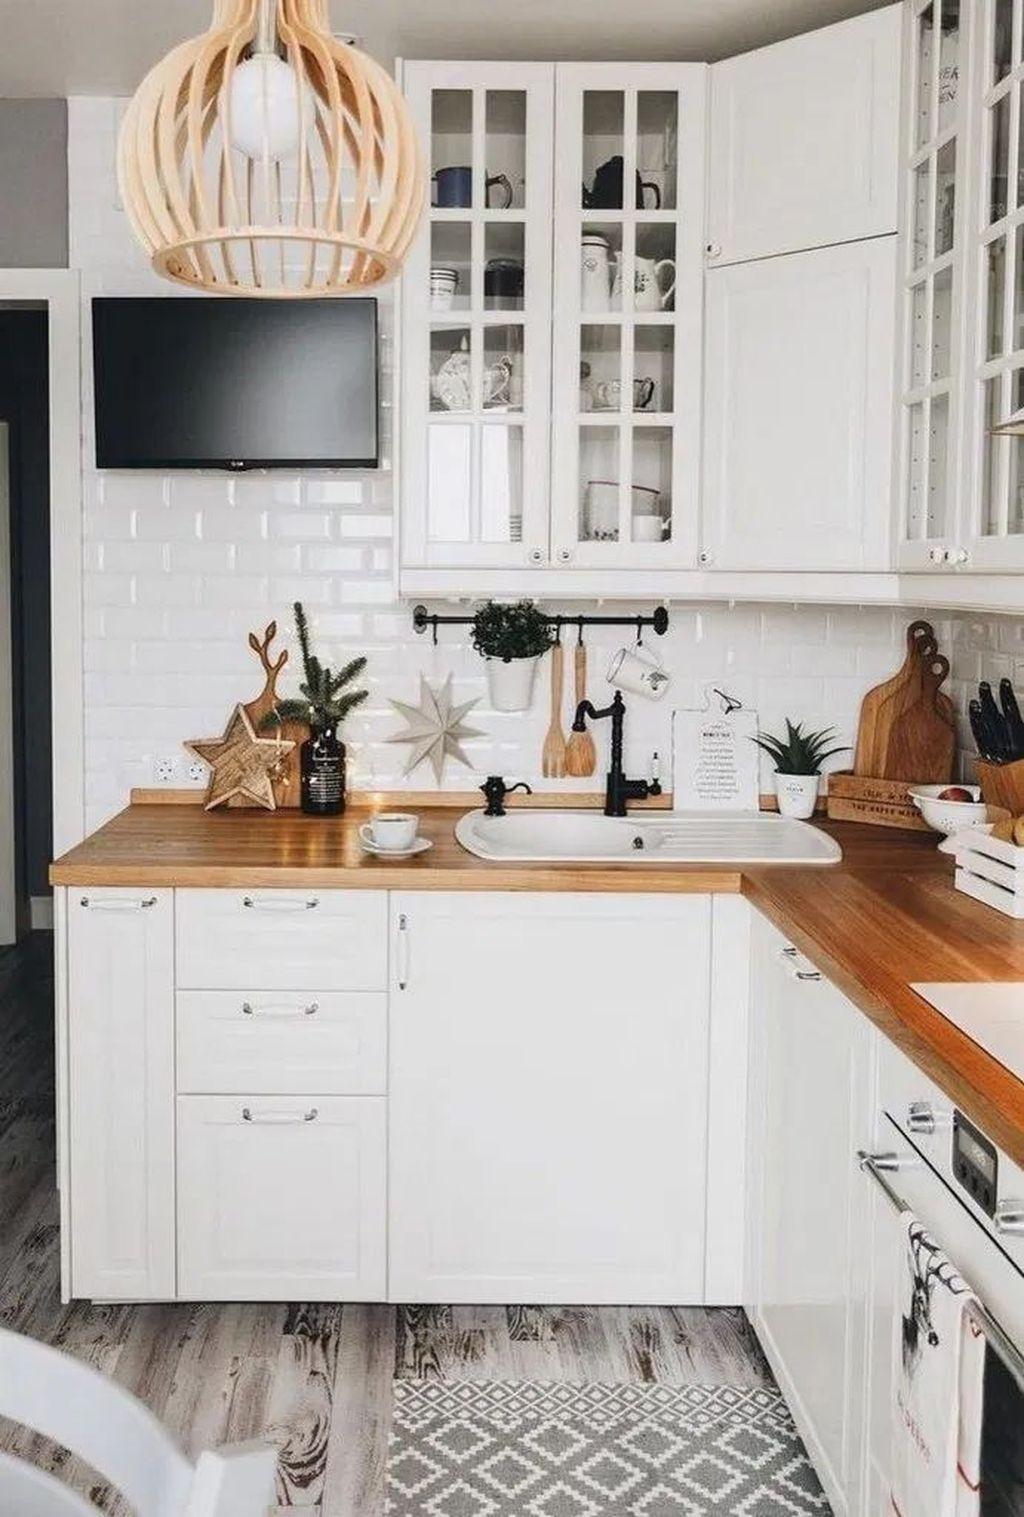 Popular Apartment Kitchen Design Ideas You Should Copy 20